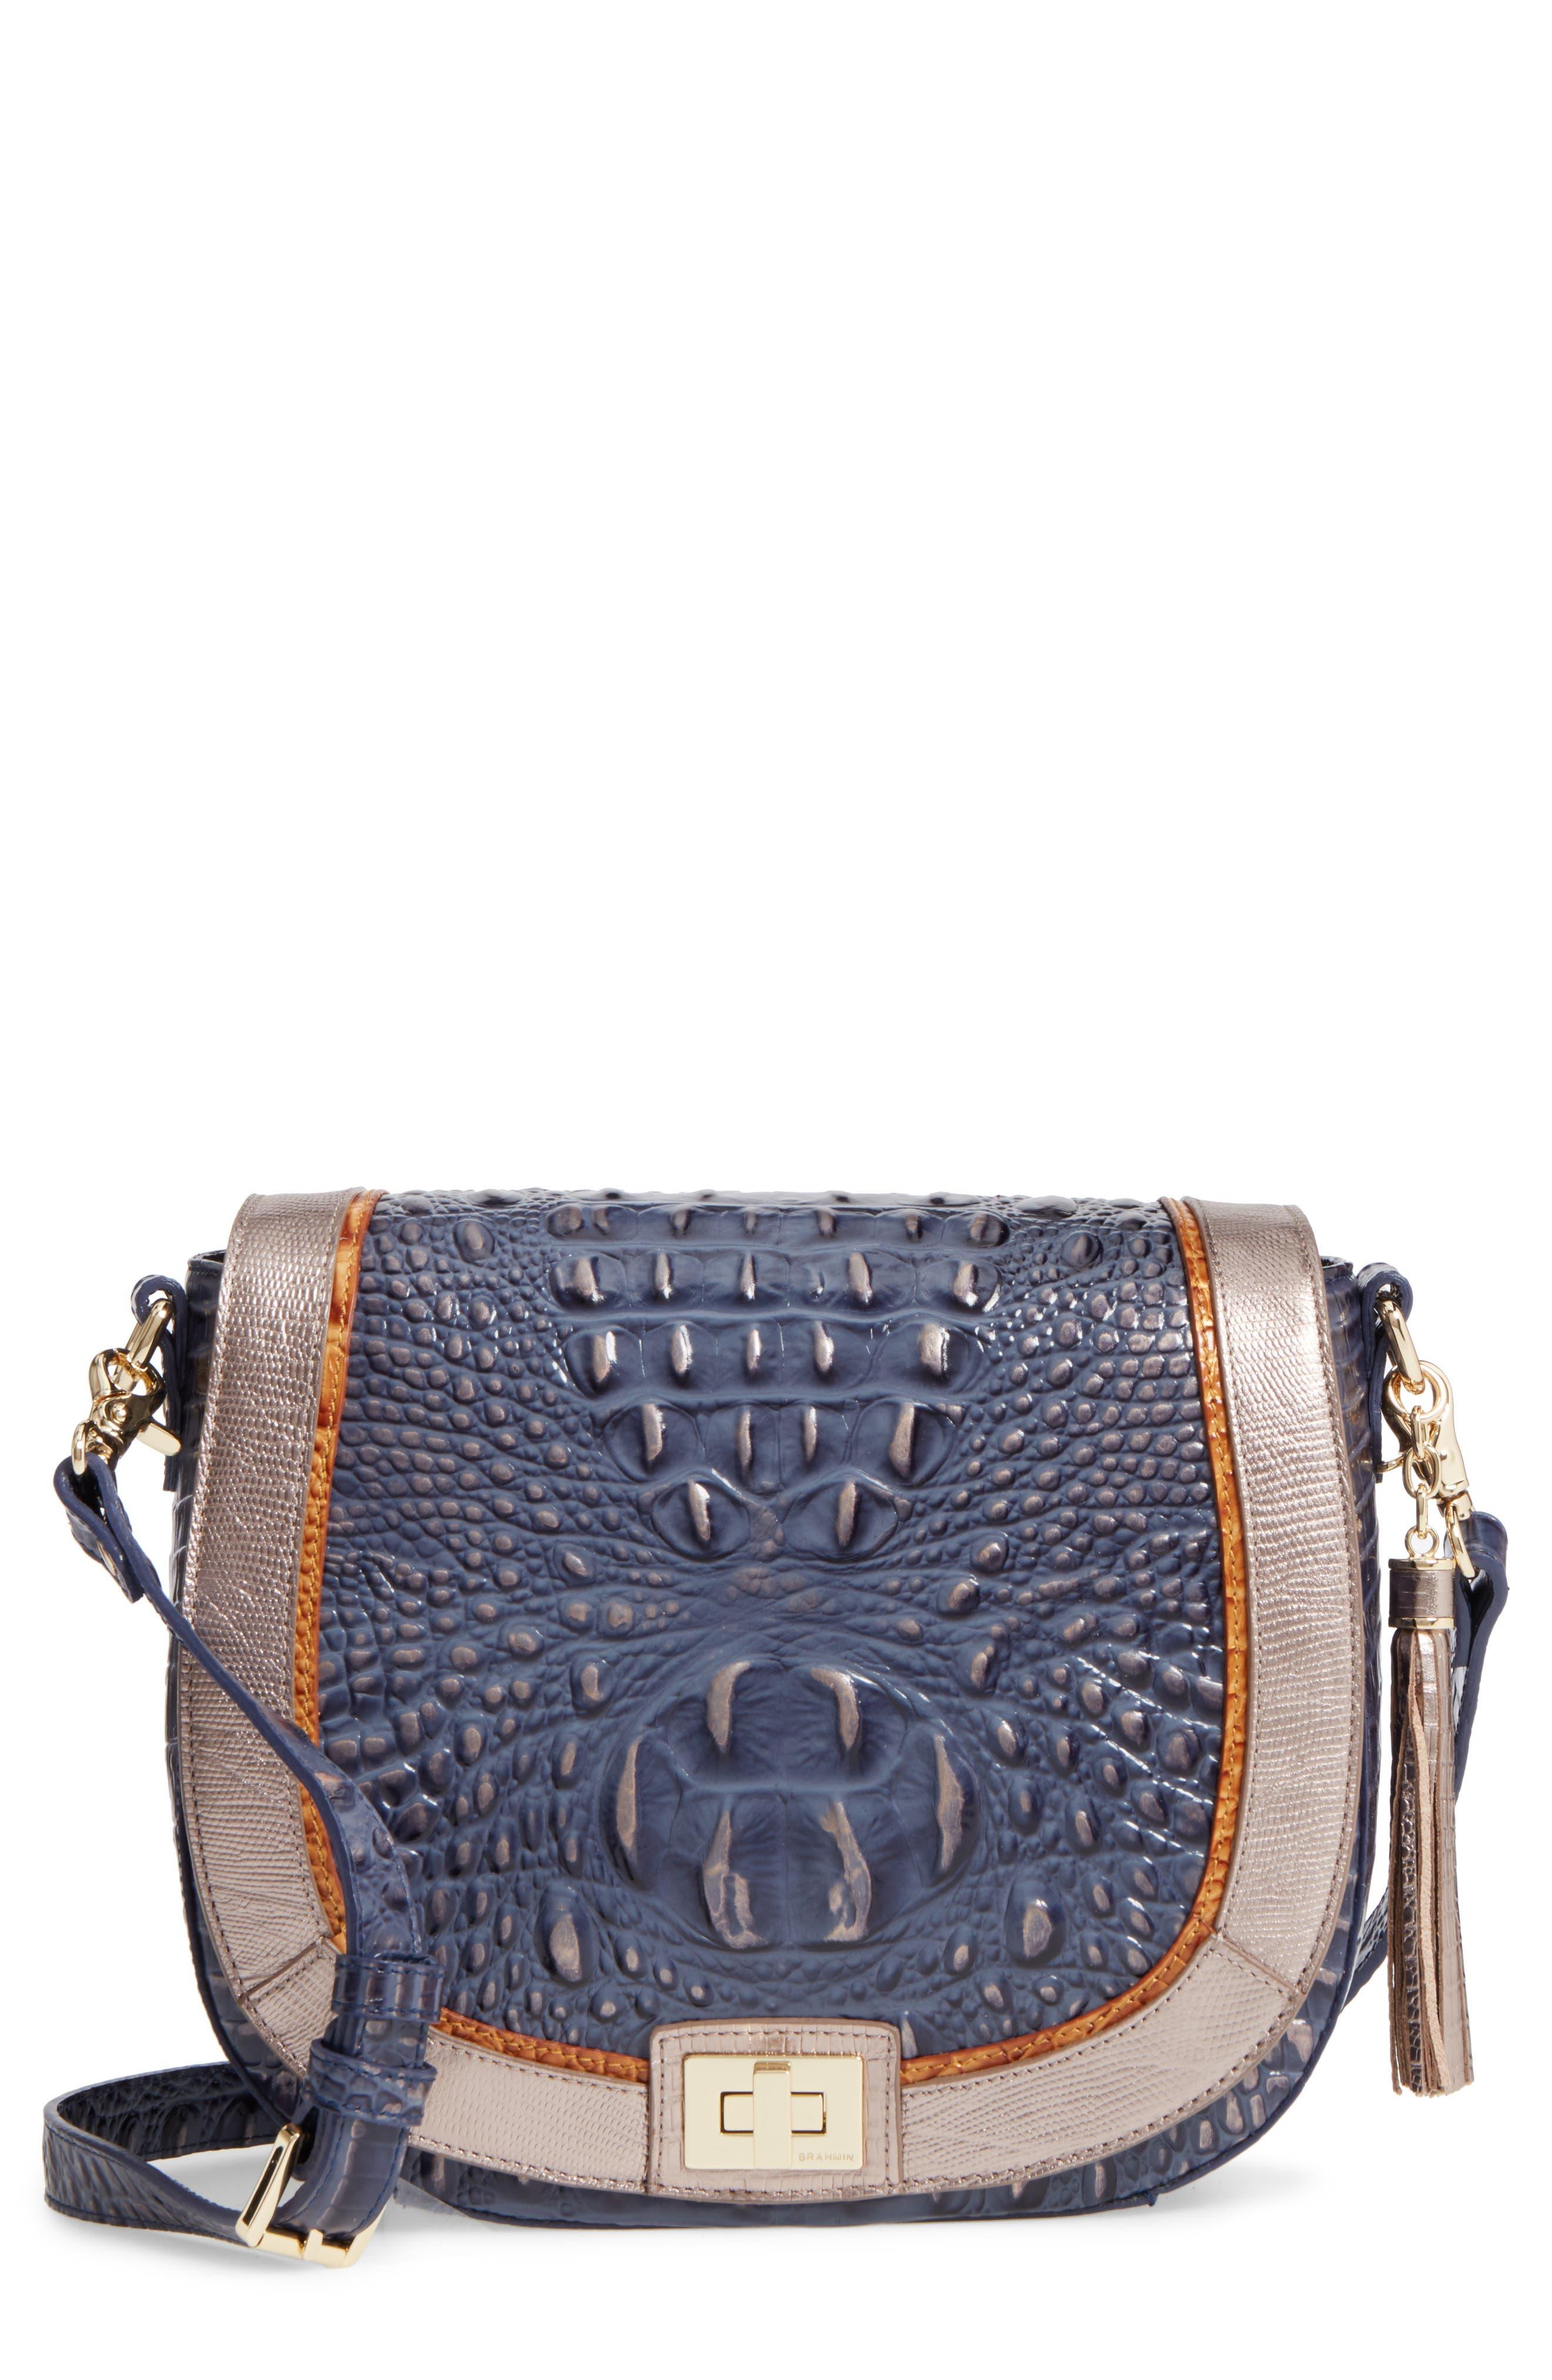 Brahmin Andesite Lucca Sonny Leather Crossbody Bag